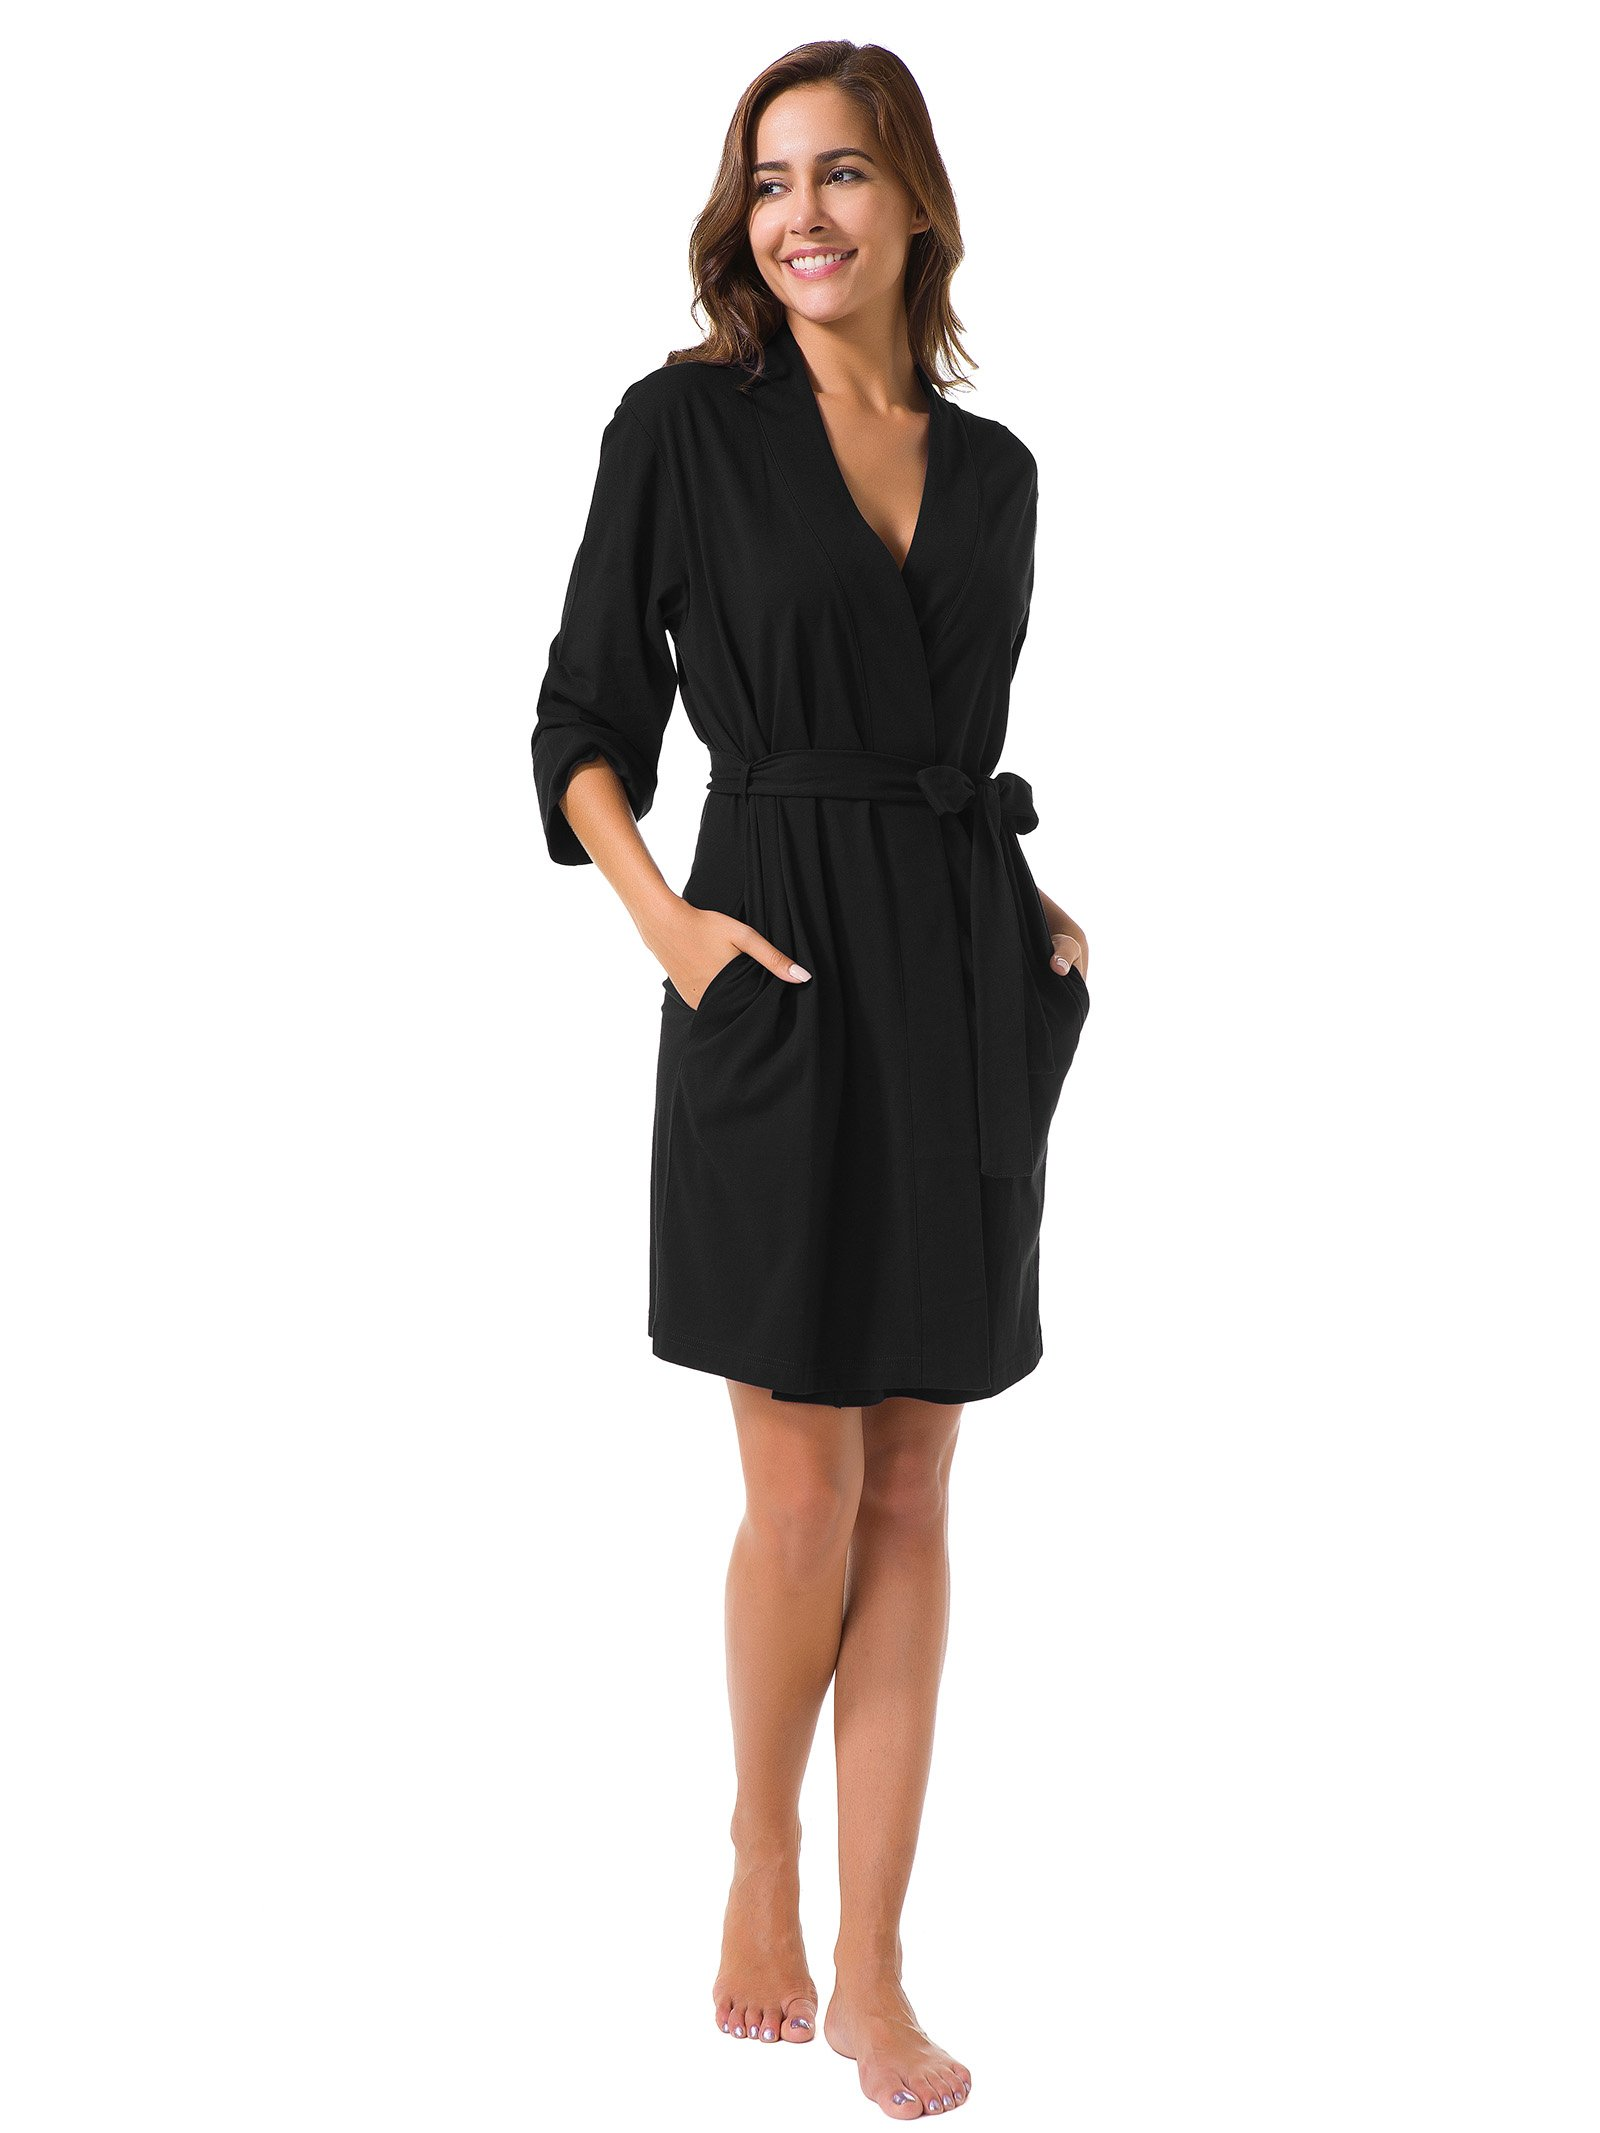 SIORO Cotton Robes Lightweight Kimono Robe Gowns Soft Knit Bathrobe Nightwear V-Neck Loungewear Sexy Sleepwear Short for Women, Black, S by SIORO (Image #4)